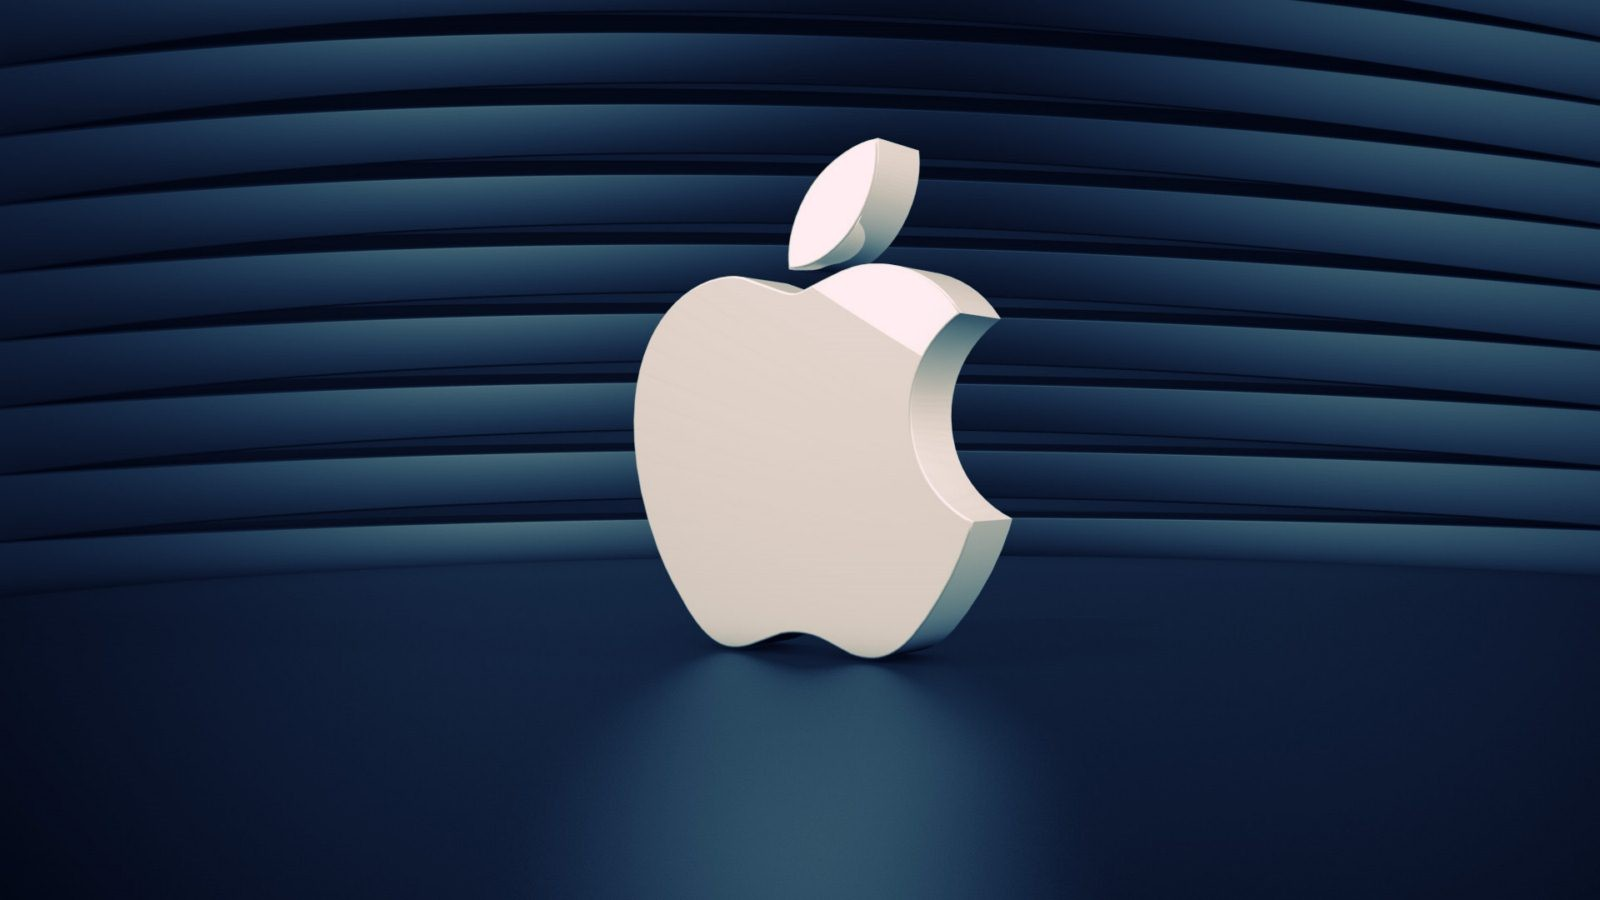 Mac Desktop Backgrounds Free Group (78+)